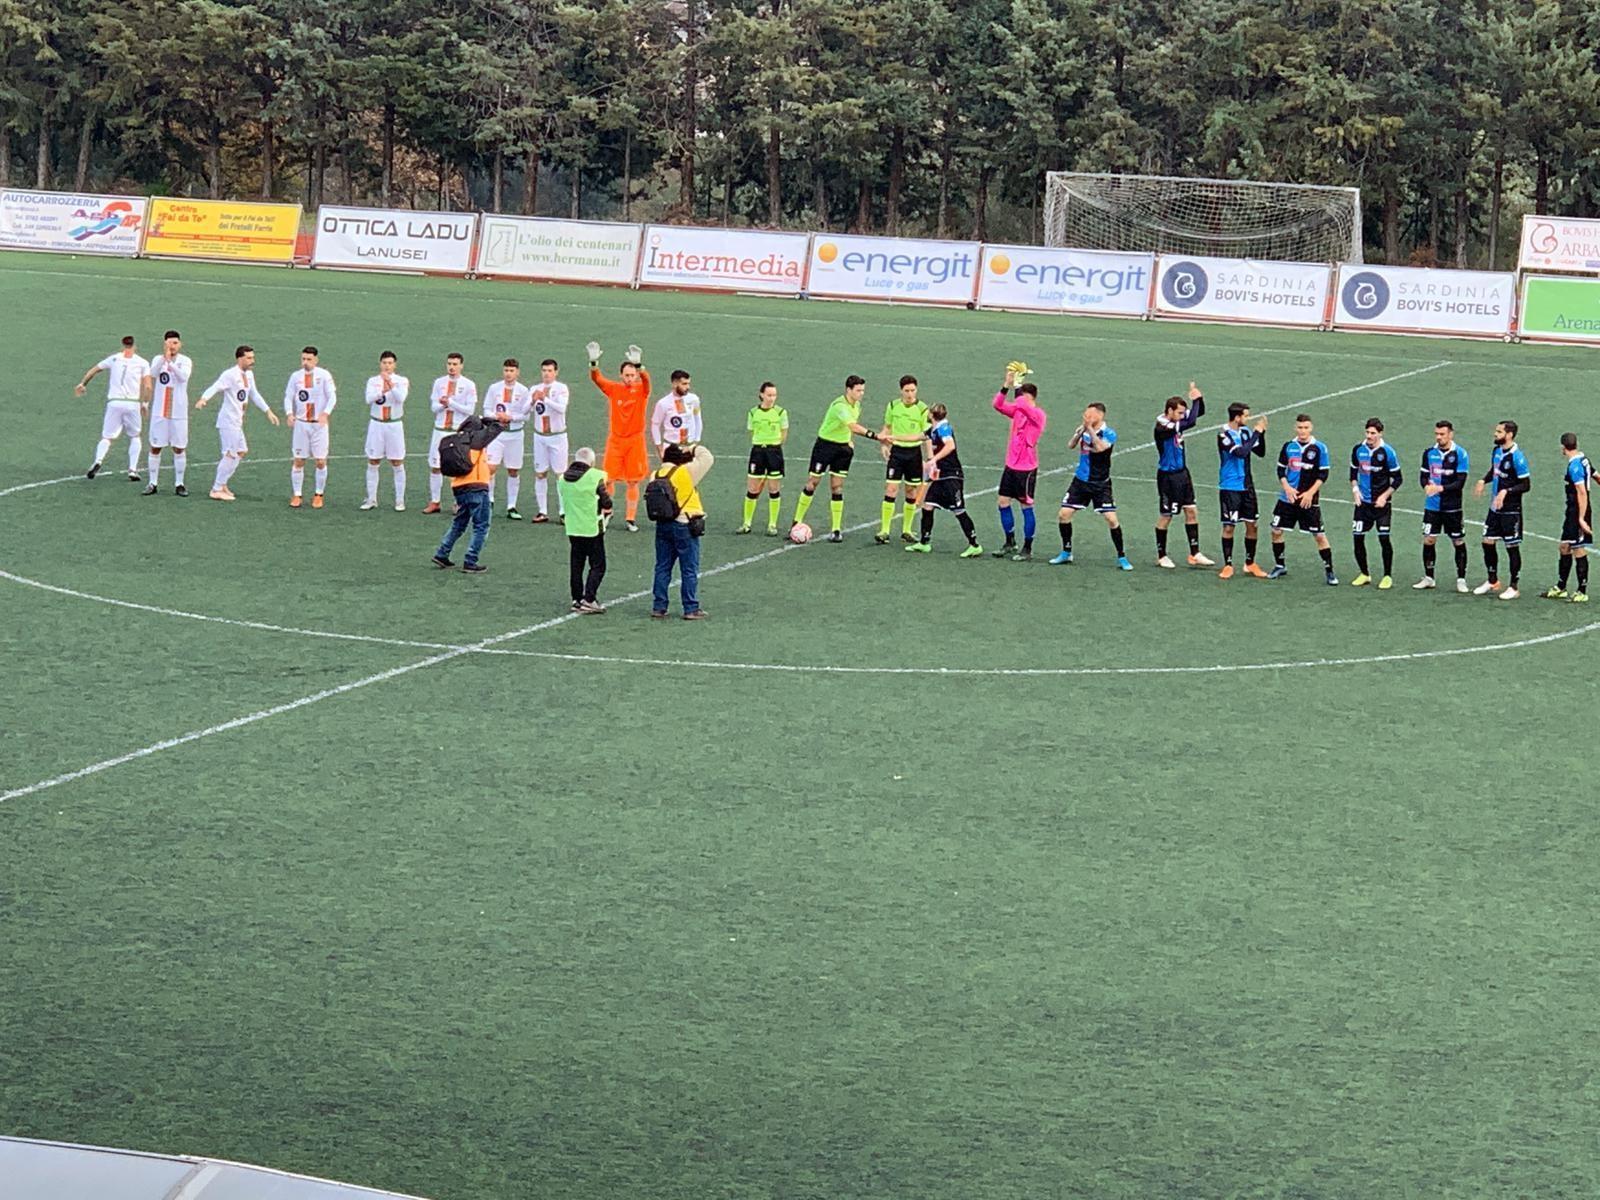 Https Www Latinaoggi Eu Sport Latina Calcio Https Www Latinaoggi